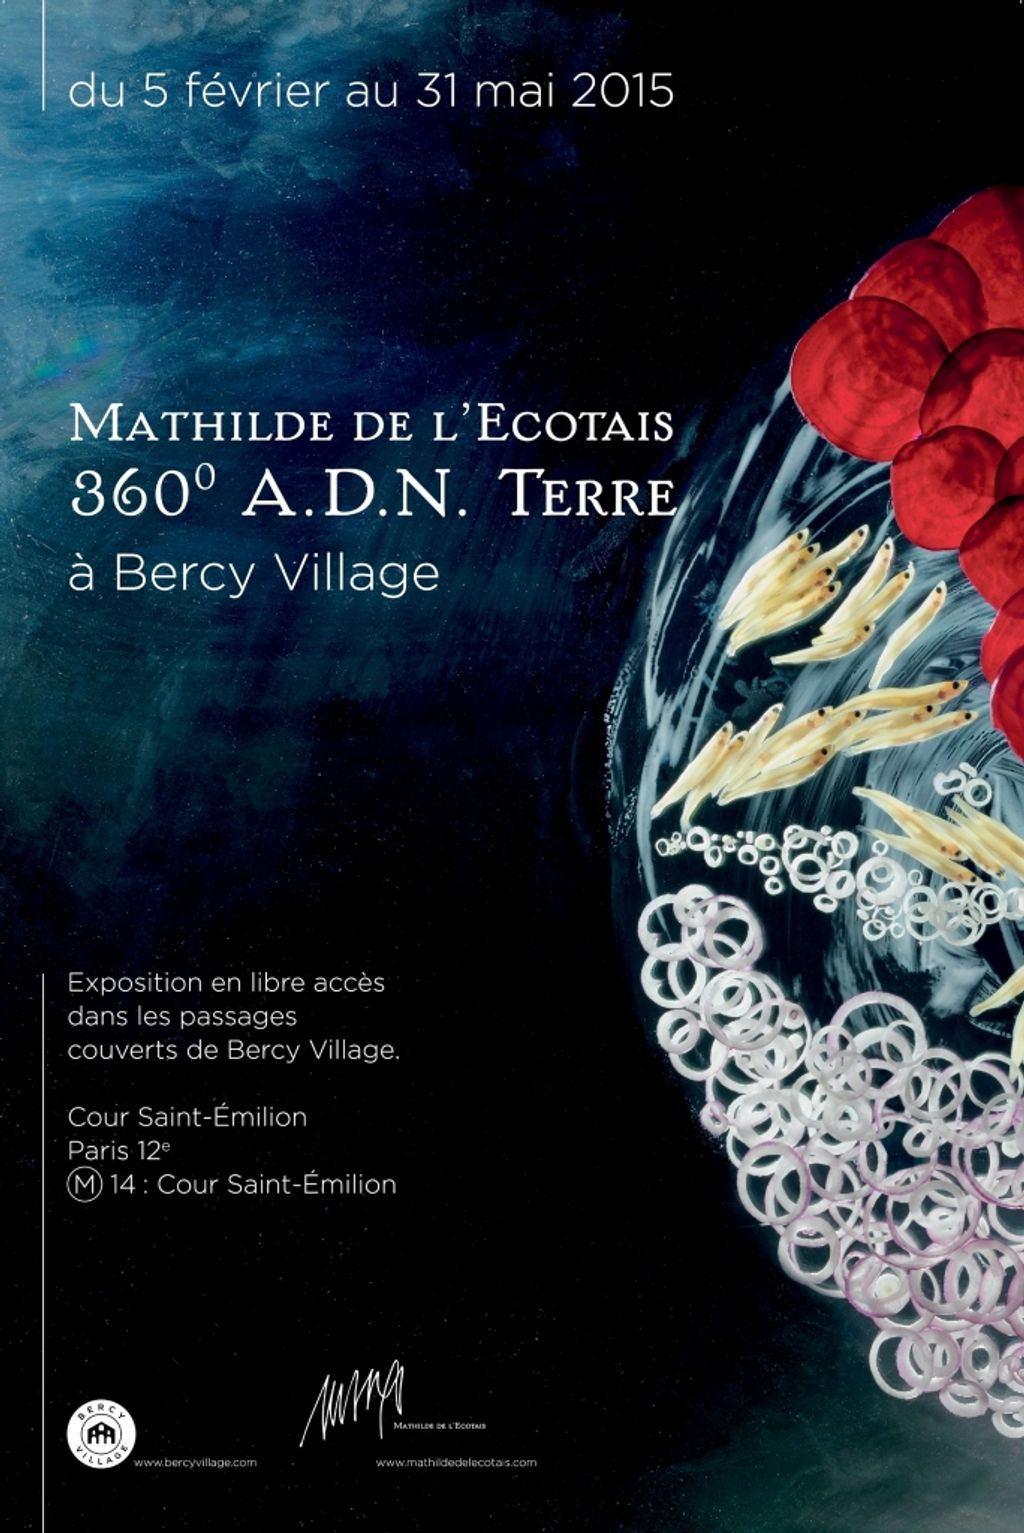 Exposition Mathilde de l'Ecotais, 360° ADN Terre